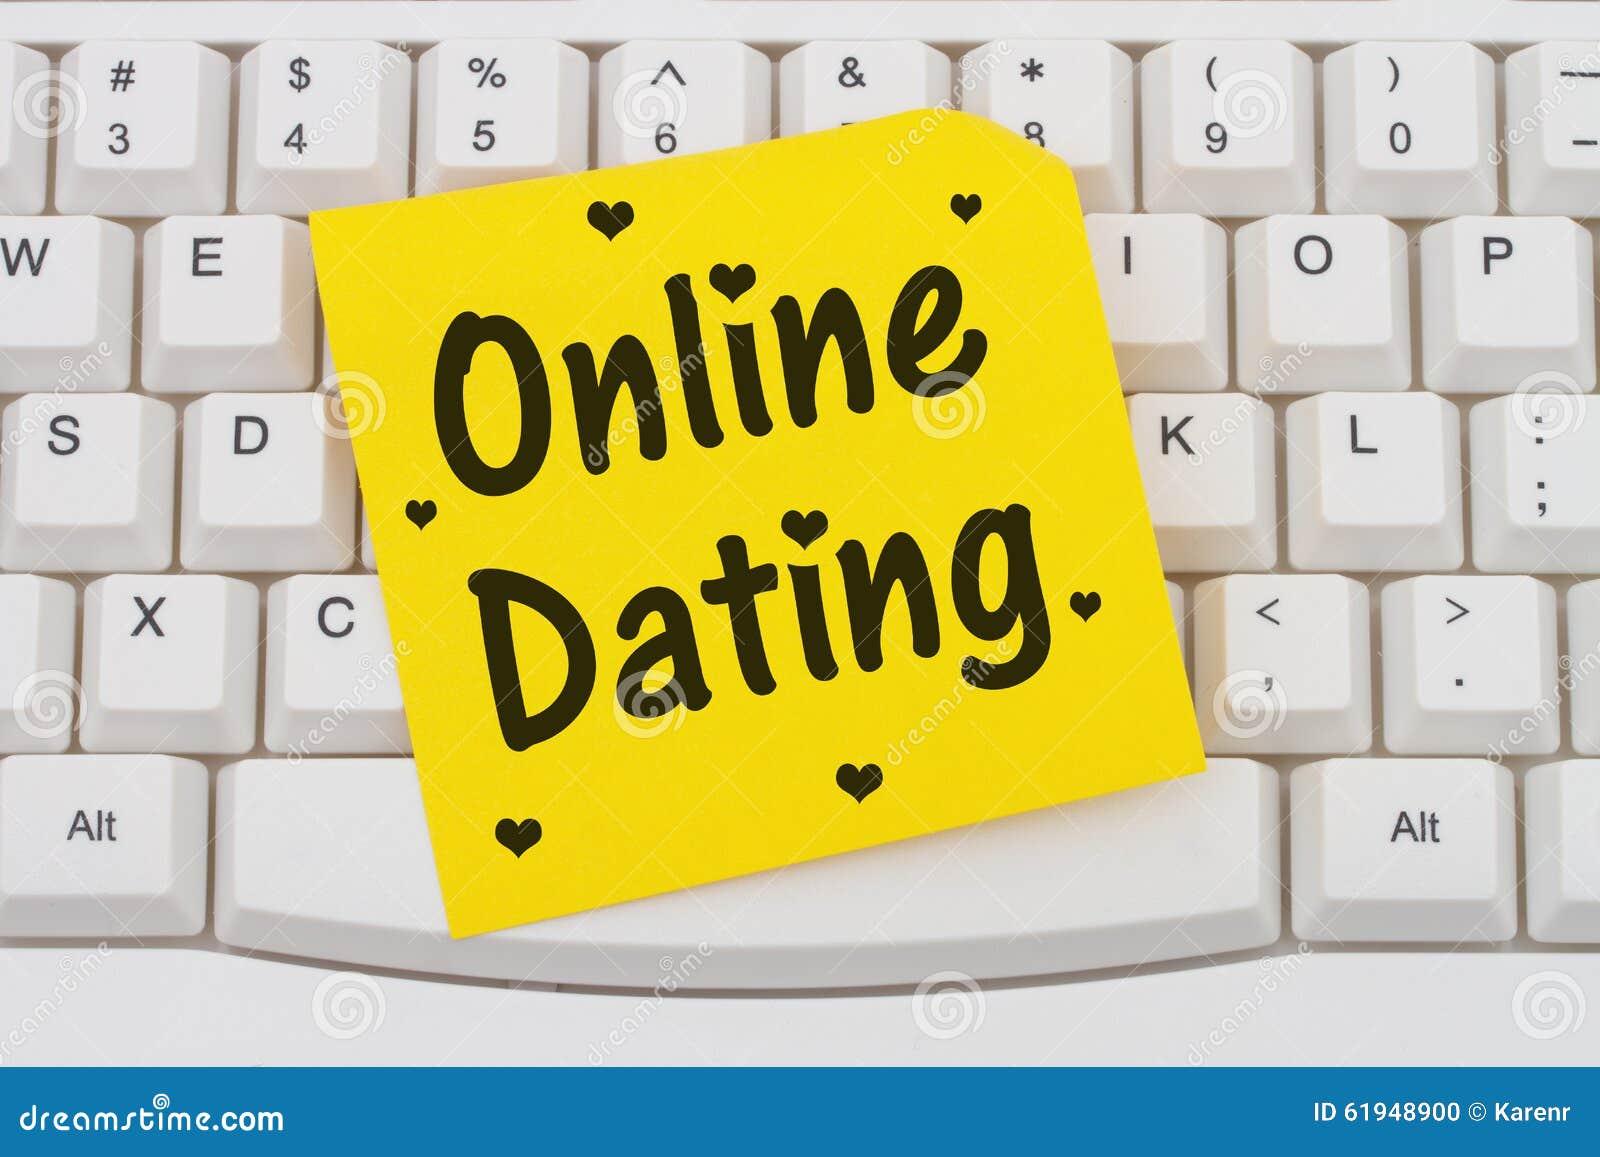 dating a jamaican man dormtainment